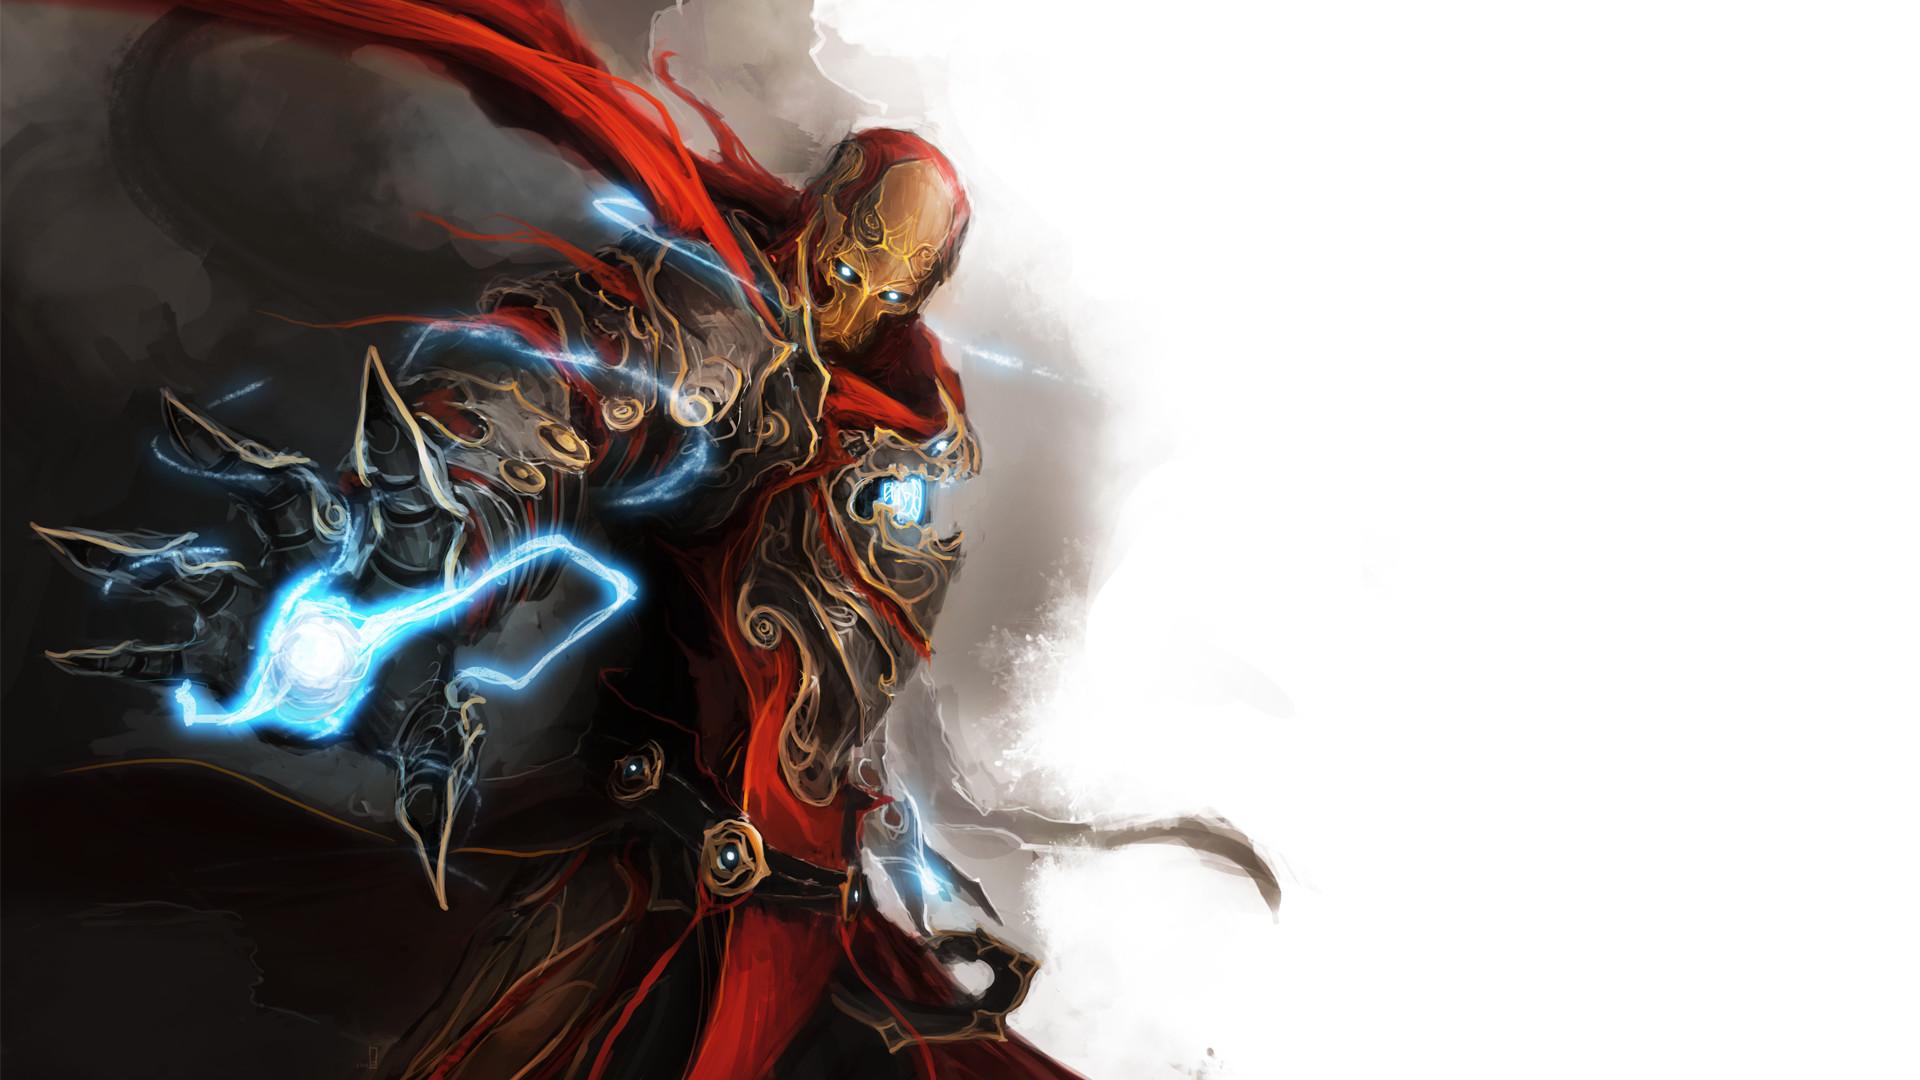 Man Artistic Iron Medieval Iron Man Hd Wallpapers, - Iron Man Abstract Art - HD Wallpaper